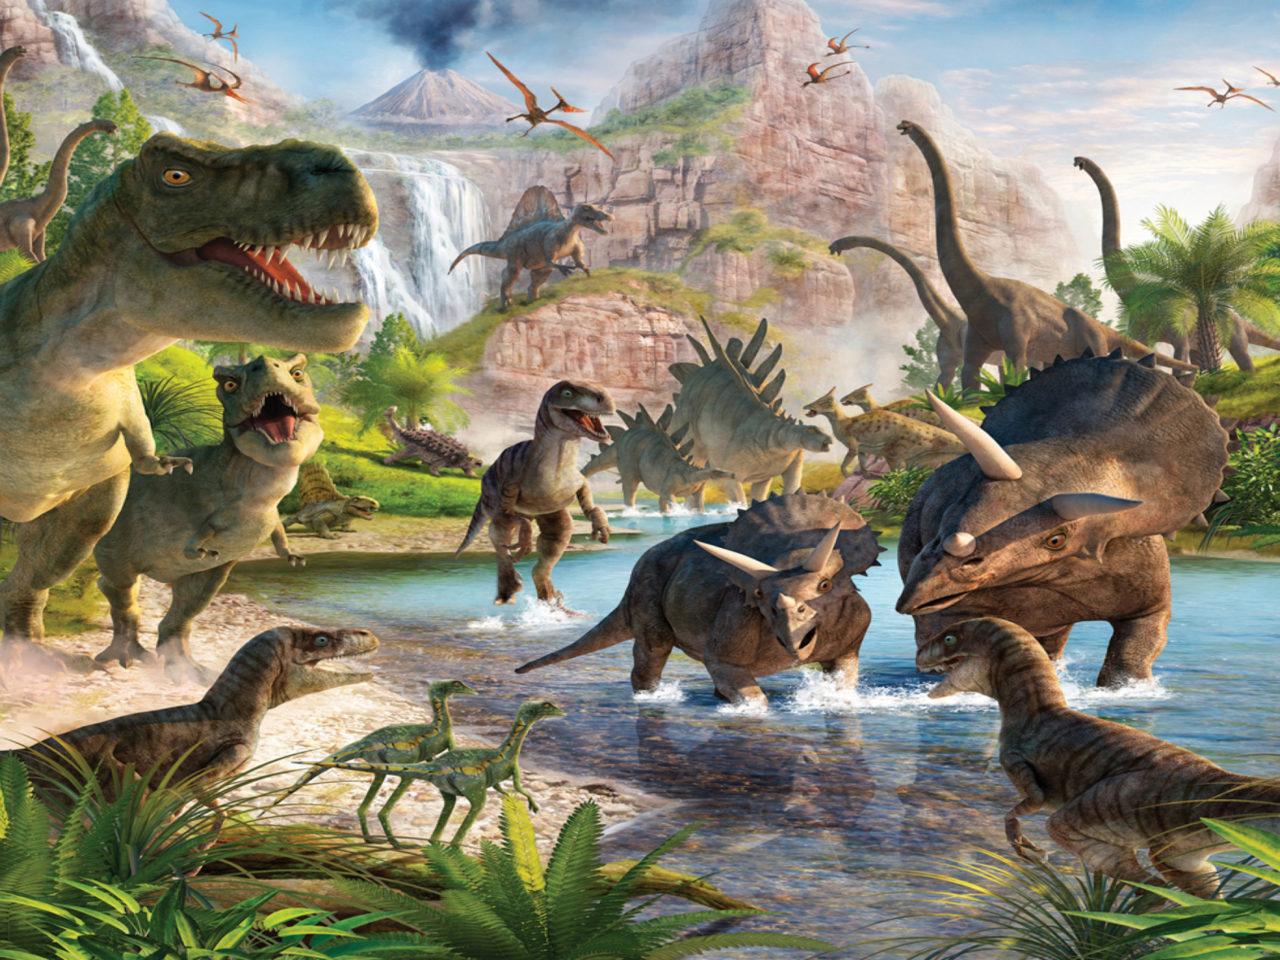 Dinosaur 3d Live Wallpaper Dinosaurs Wallpapers For Desktop 11686 Full Hd Wallpaper